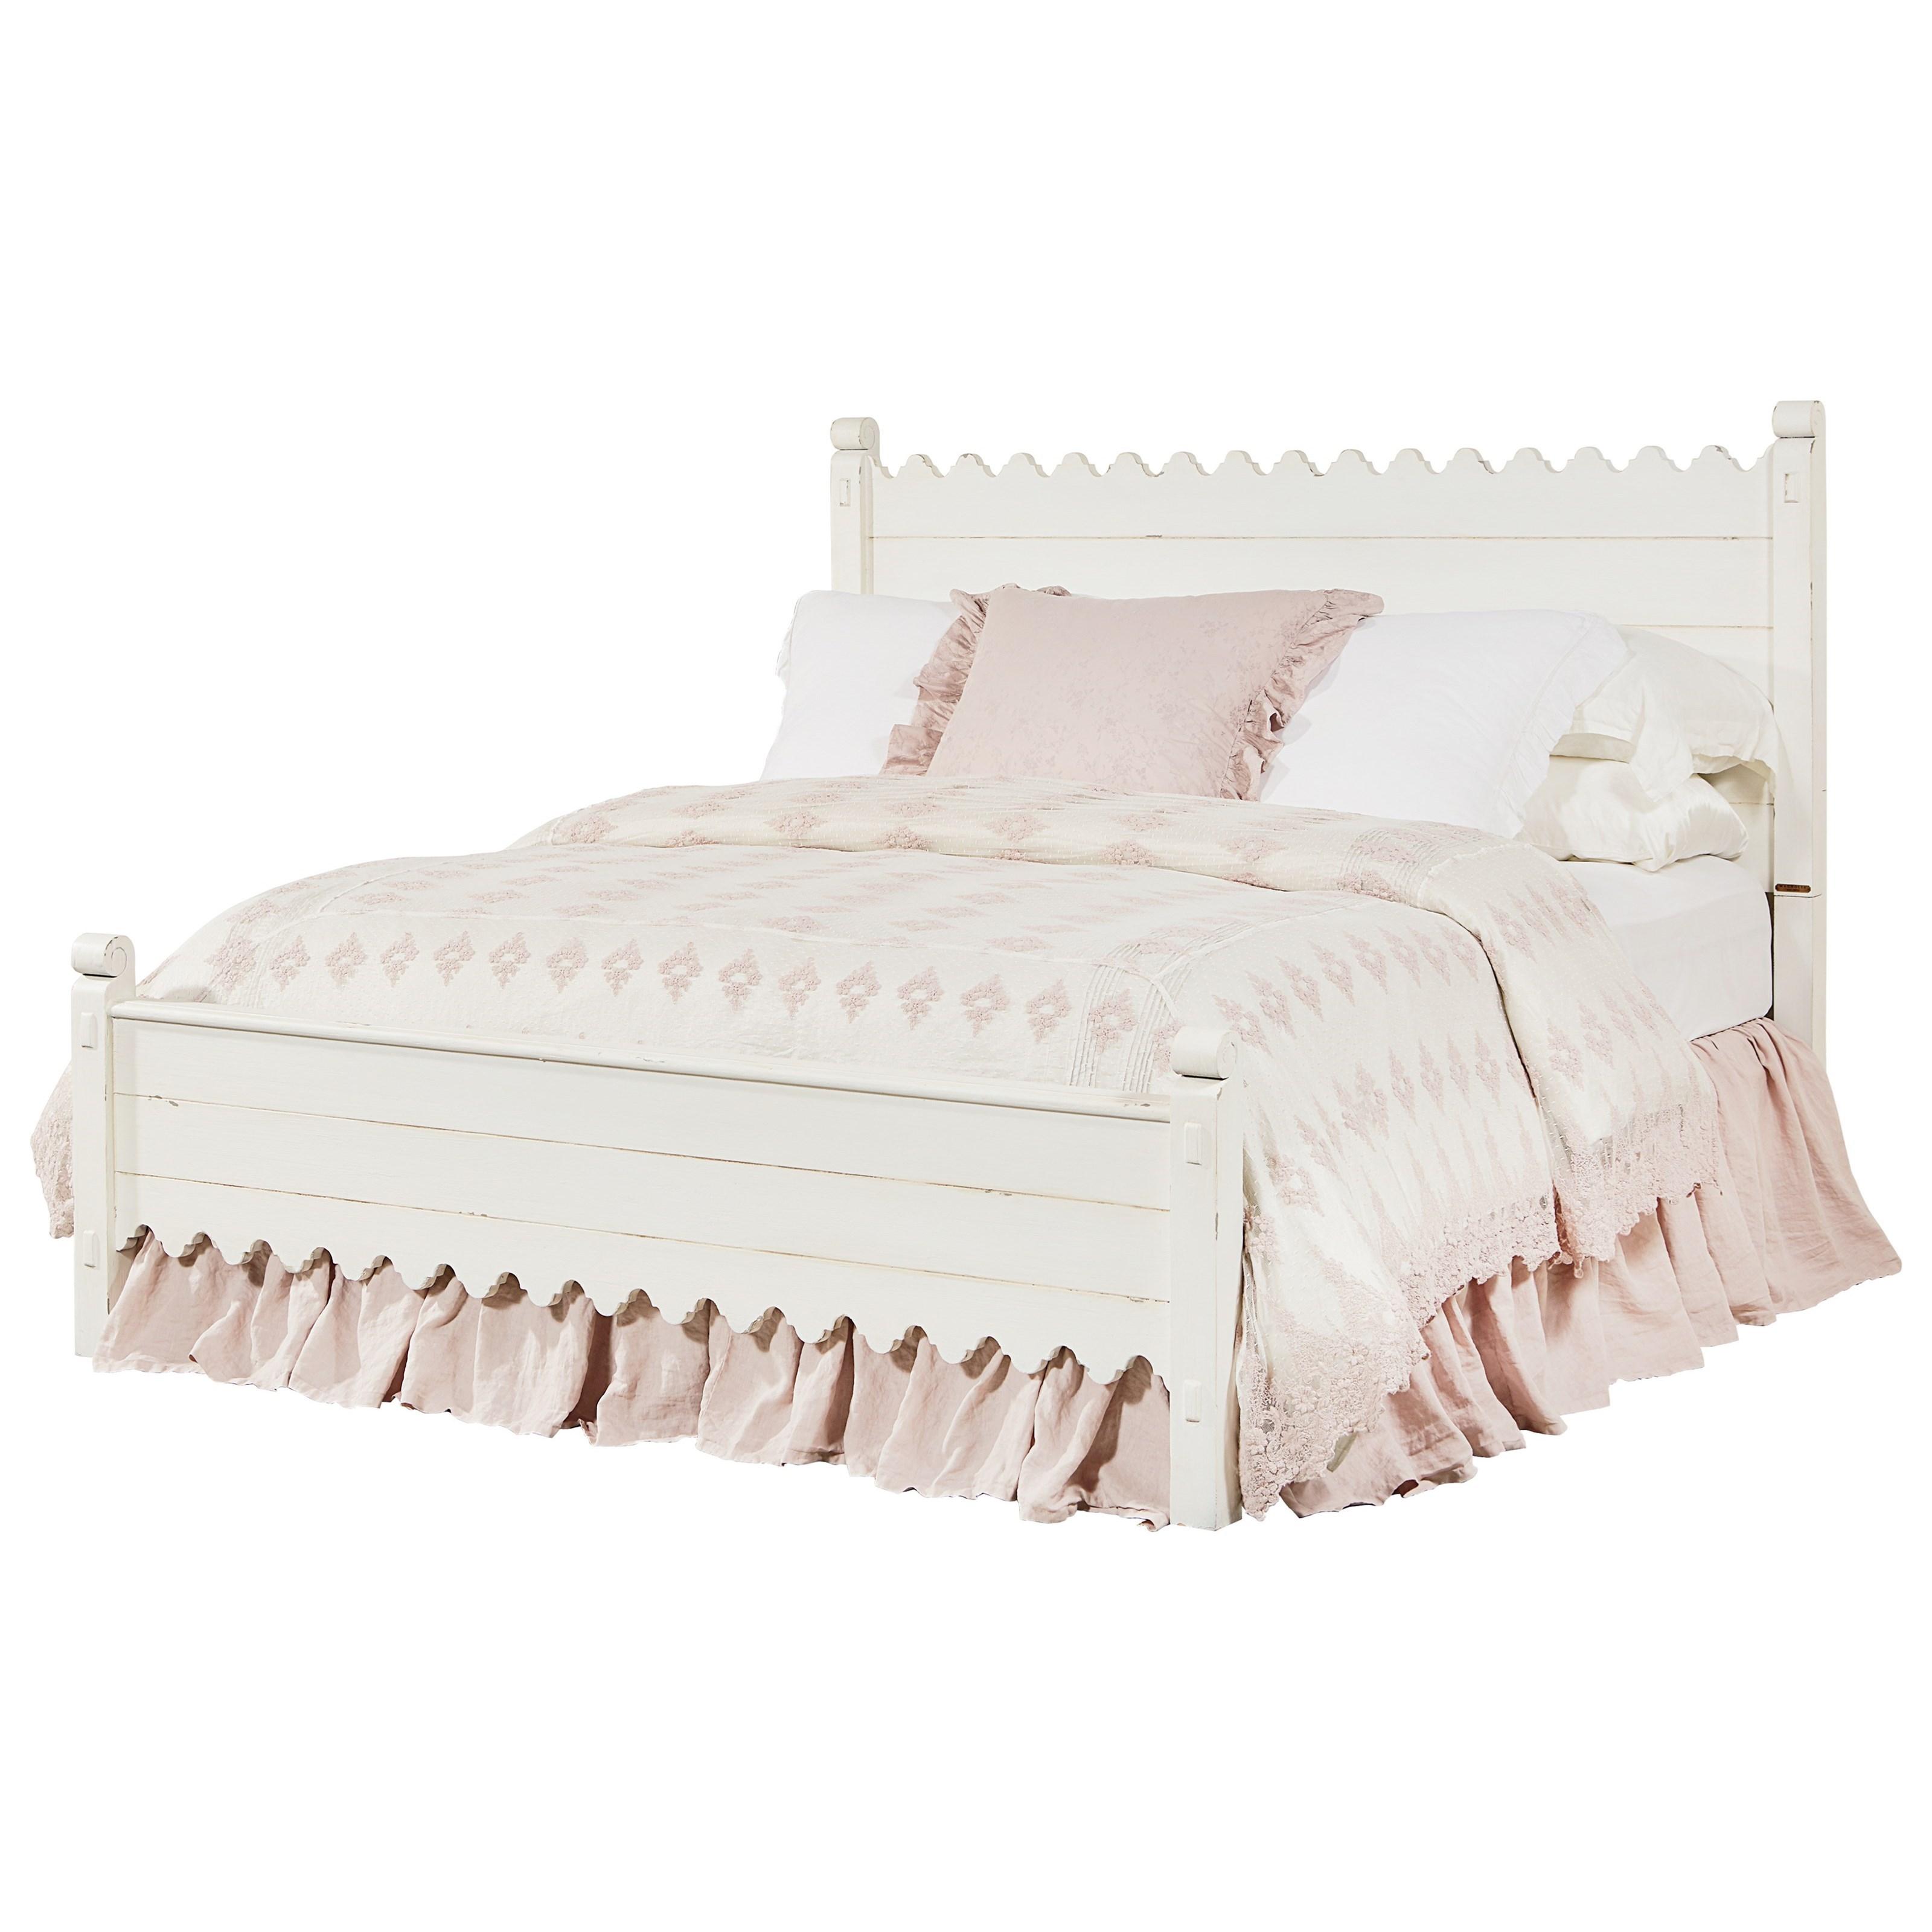 shop amazon count covers com sateen b cotton duvet king egyptian hotel pinzon stitch thread scallop cover